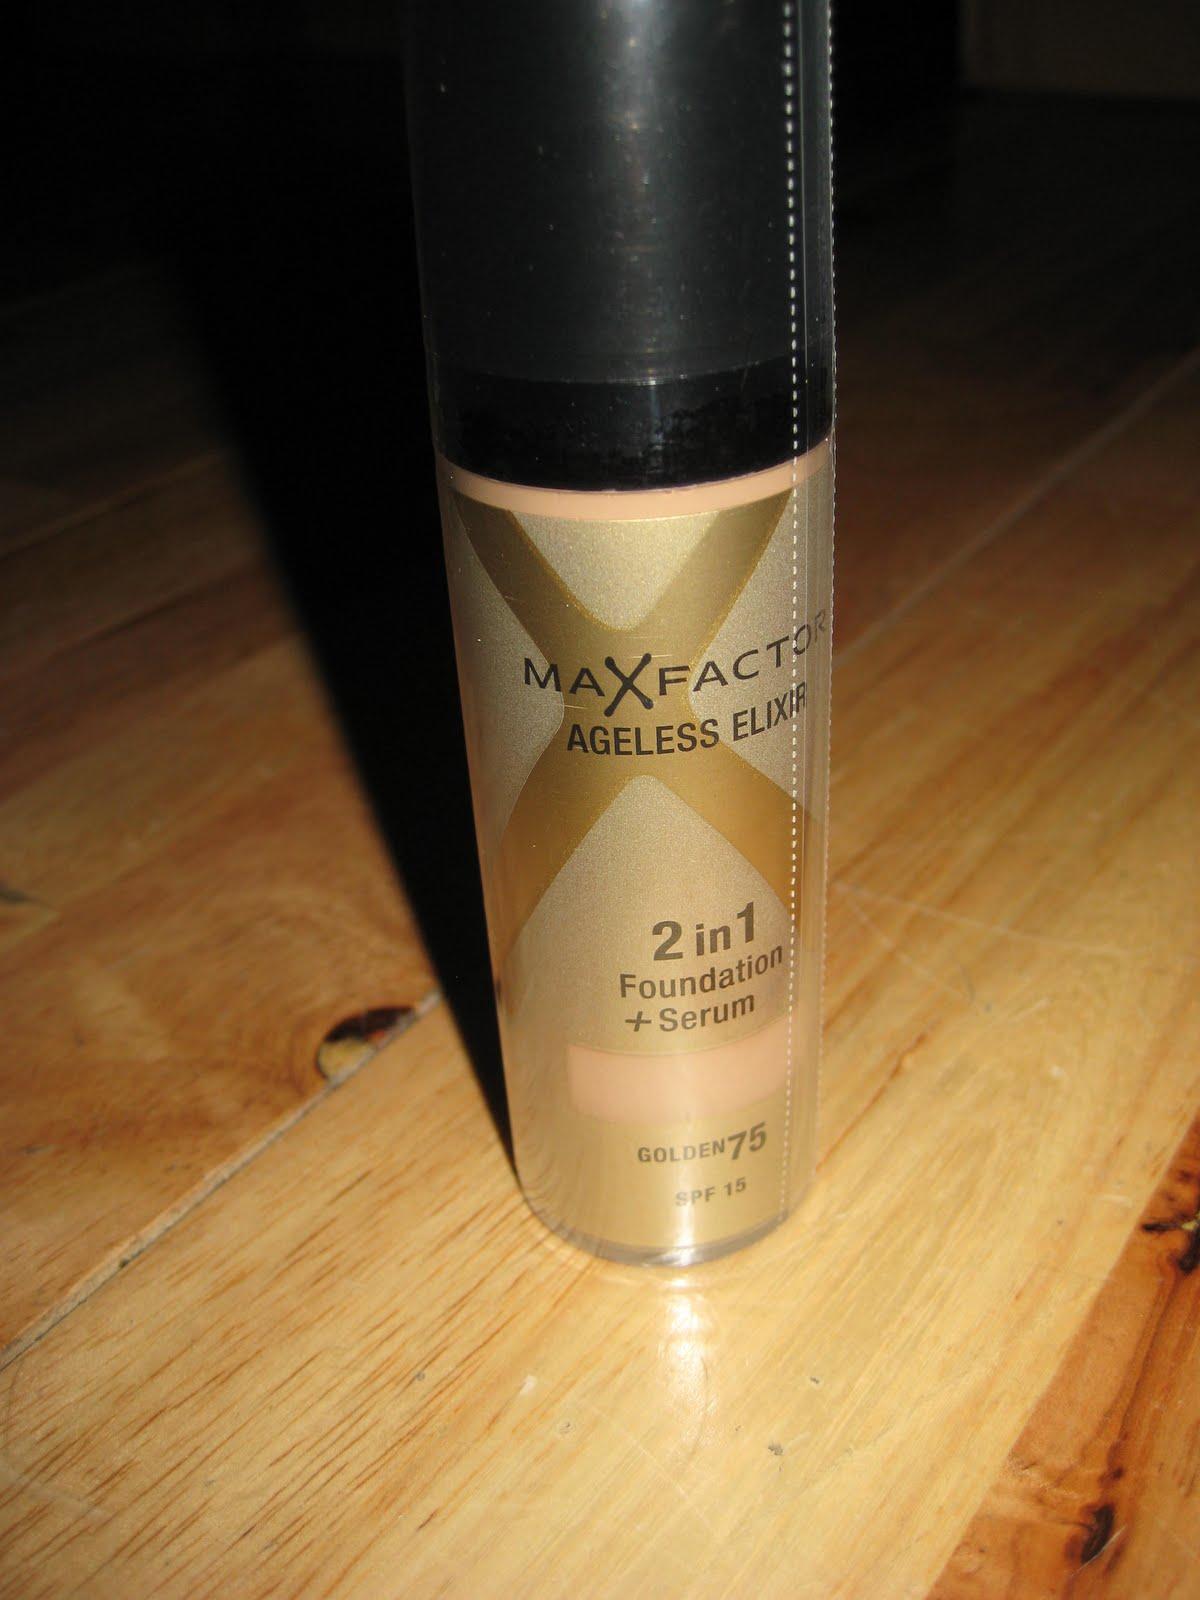 max factor ageless elixir 2 in 1 foundation